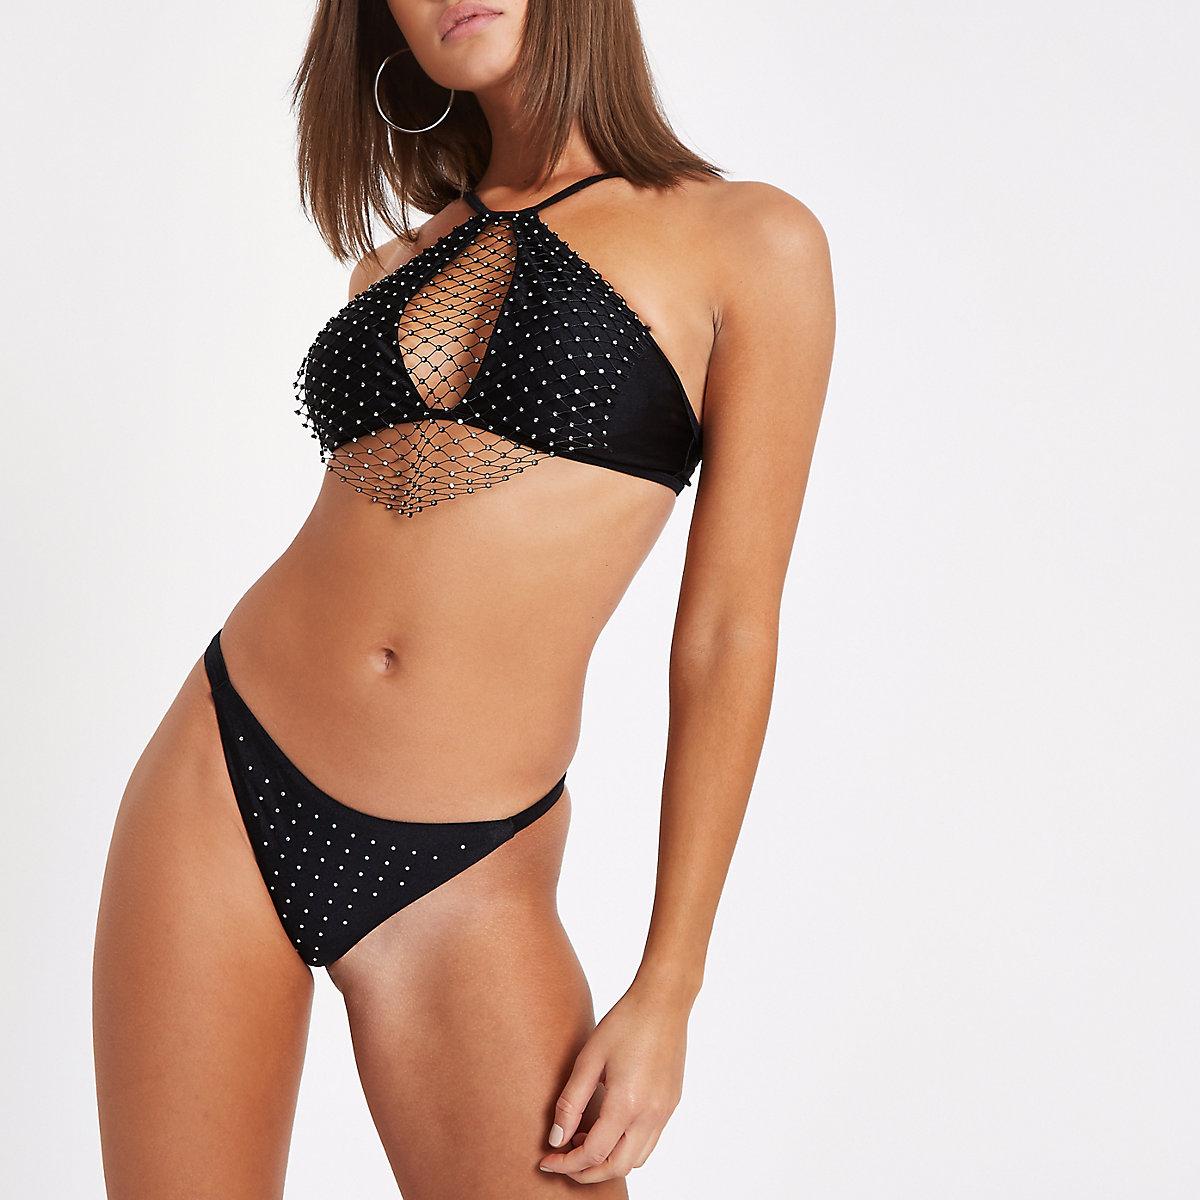 Black rhinestone thong bikini bottoms